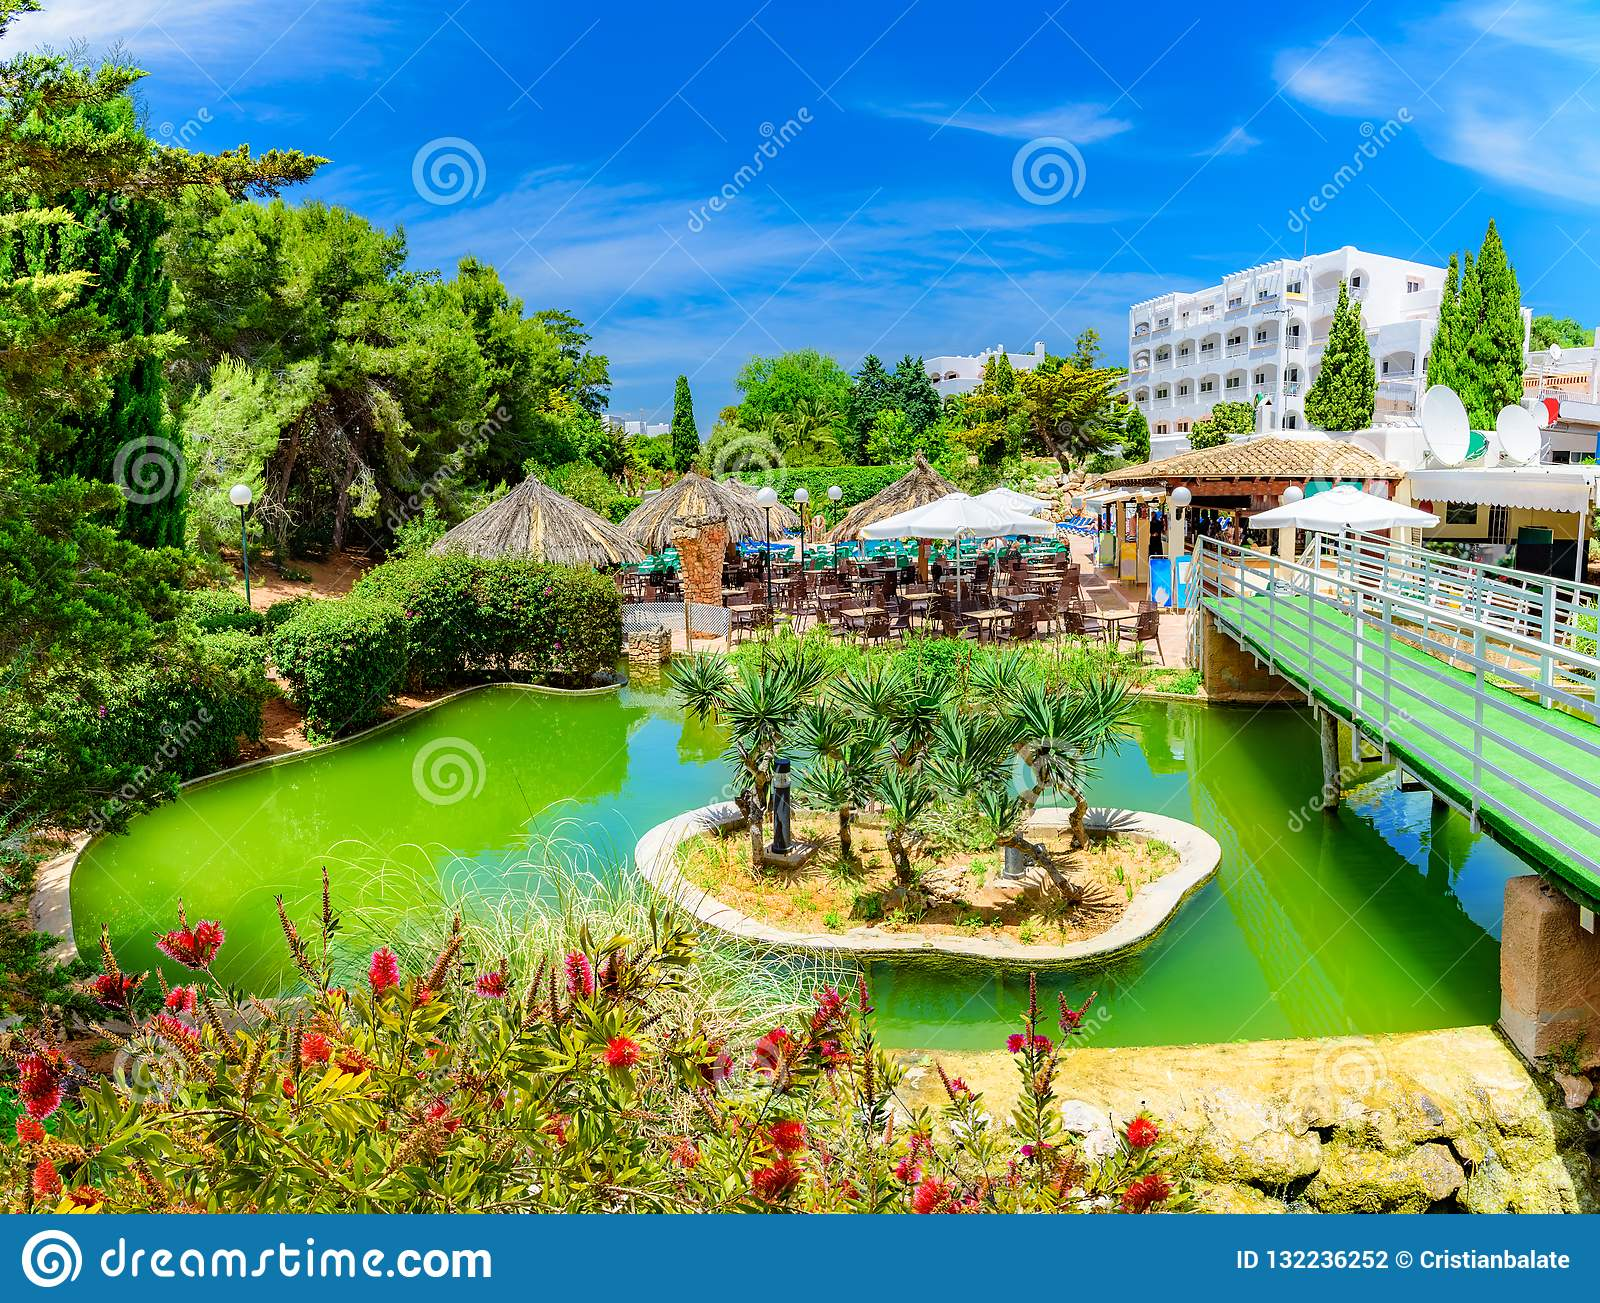 Exotic Tropical Garden In Palma De Mallorca Island Spain Stock Photo Image Of Restaurant Scene 132236252